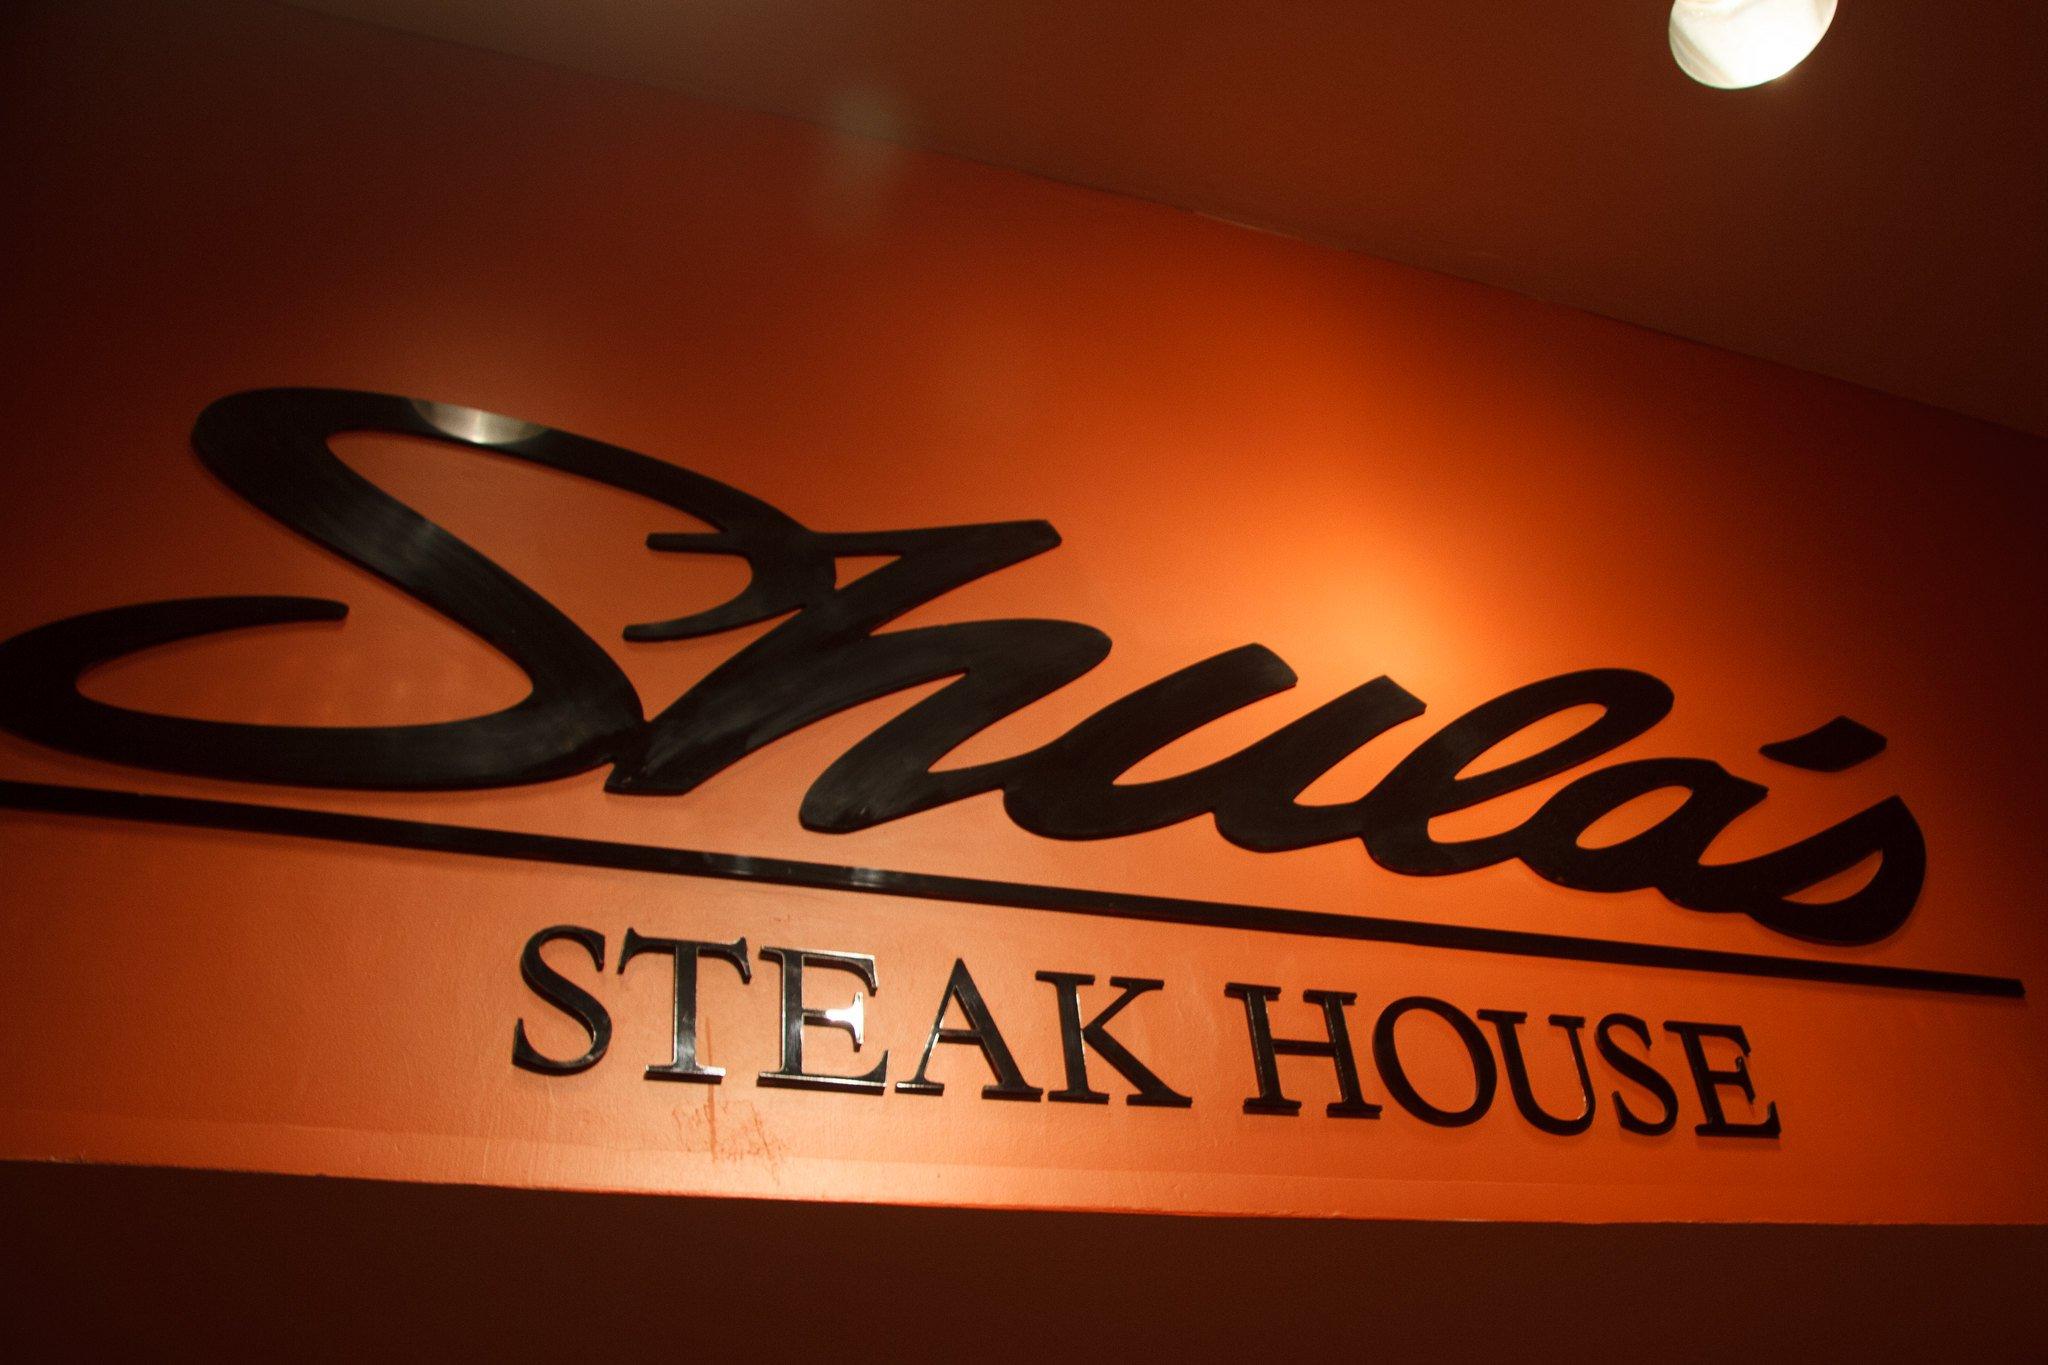 Shula's Steak House (Chandler, AZ) - WanderDisney